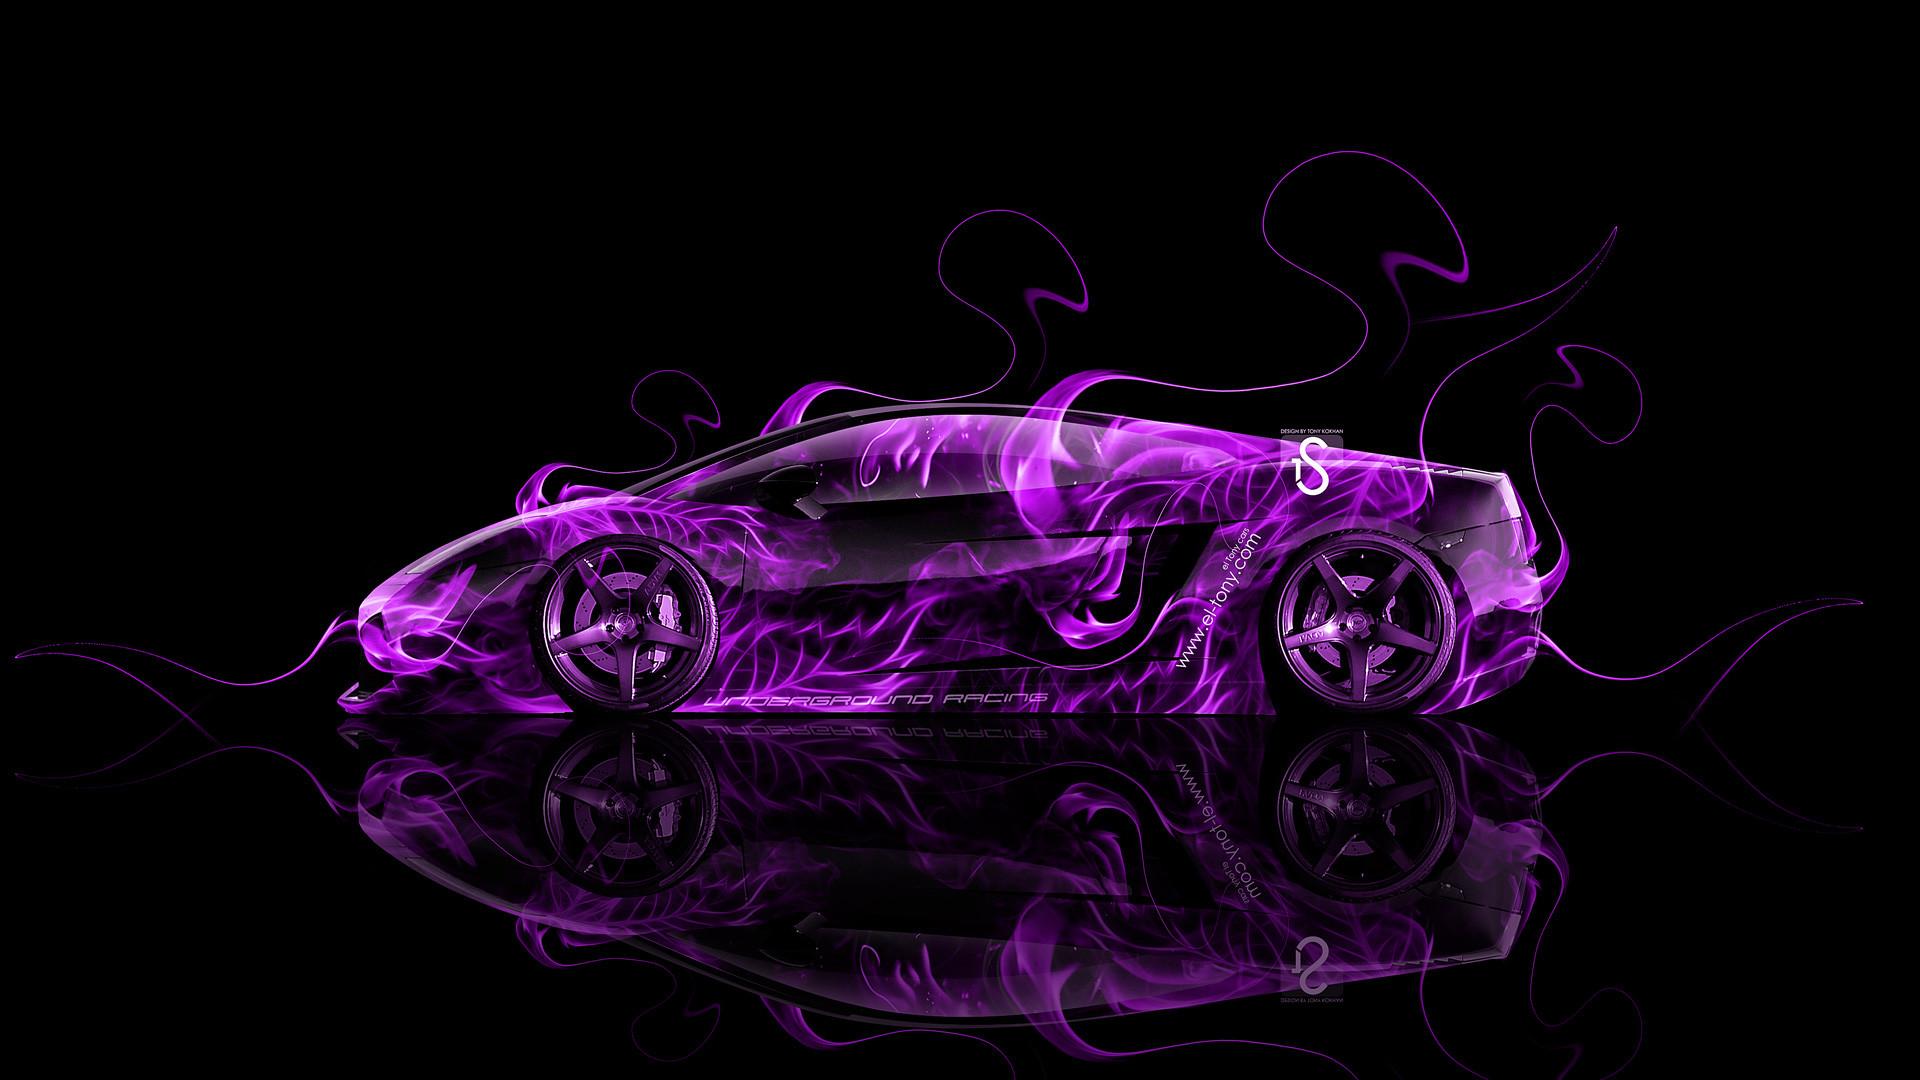 Res: 1920x1080, ... Lamborghini-Gallardo-Side-Violet-Fire-Abstract-Car-2014-